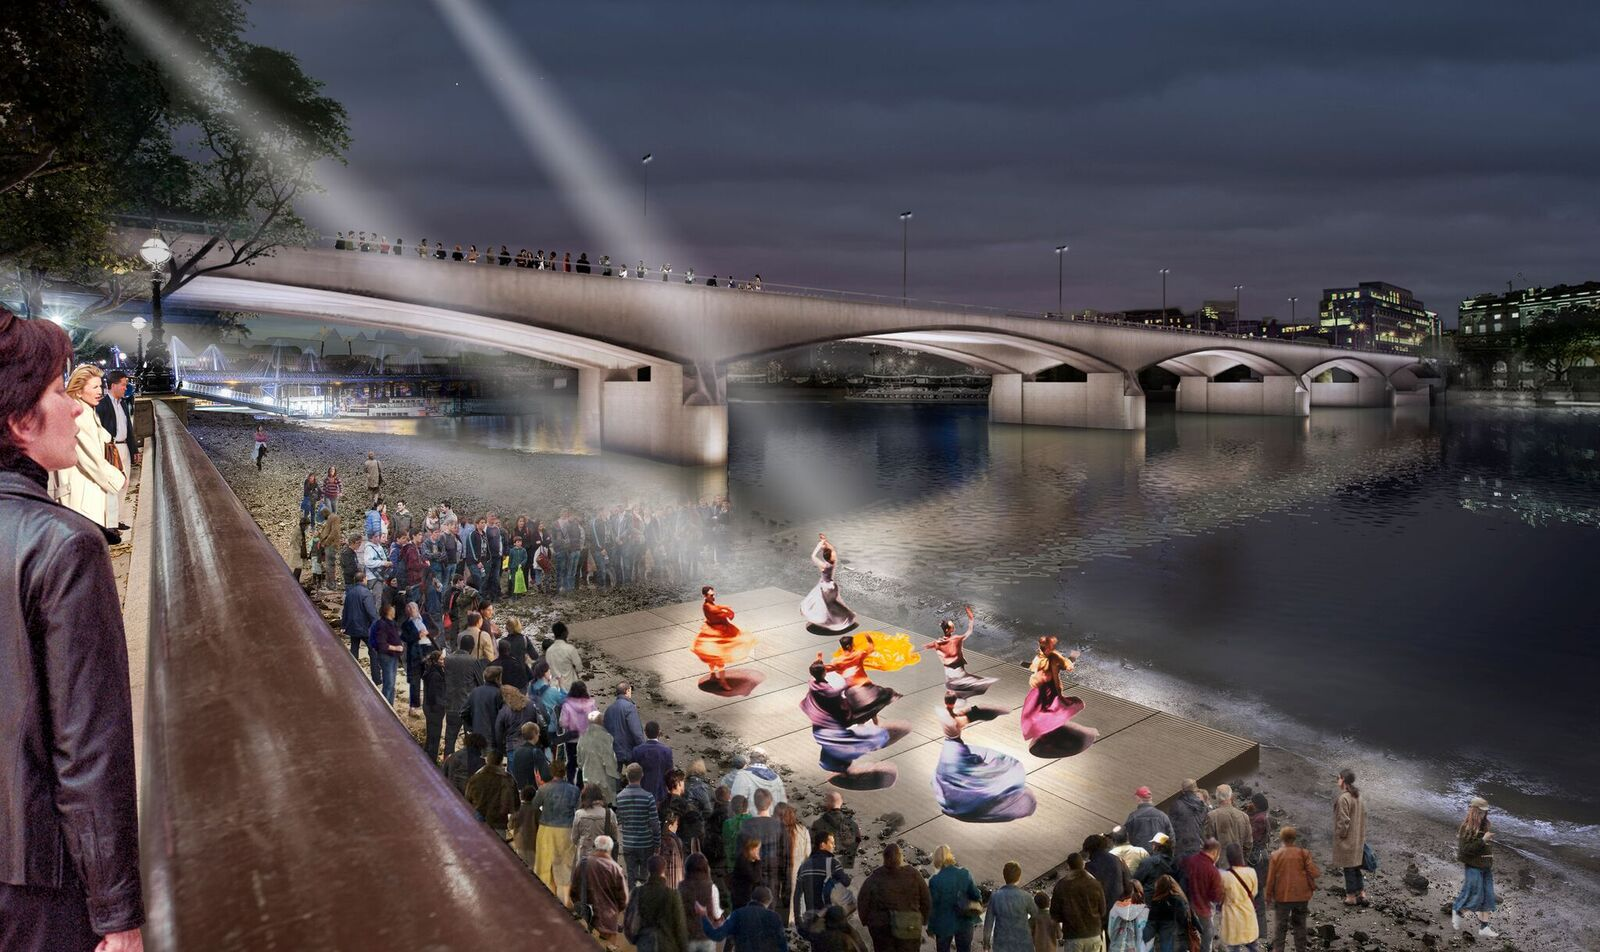 Performance à marée basse - Waterloo Bridge, London, UK © MRC and Diller Scofidio + Renfro